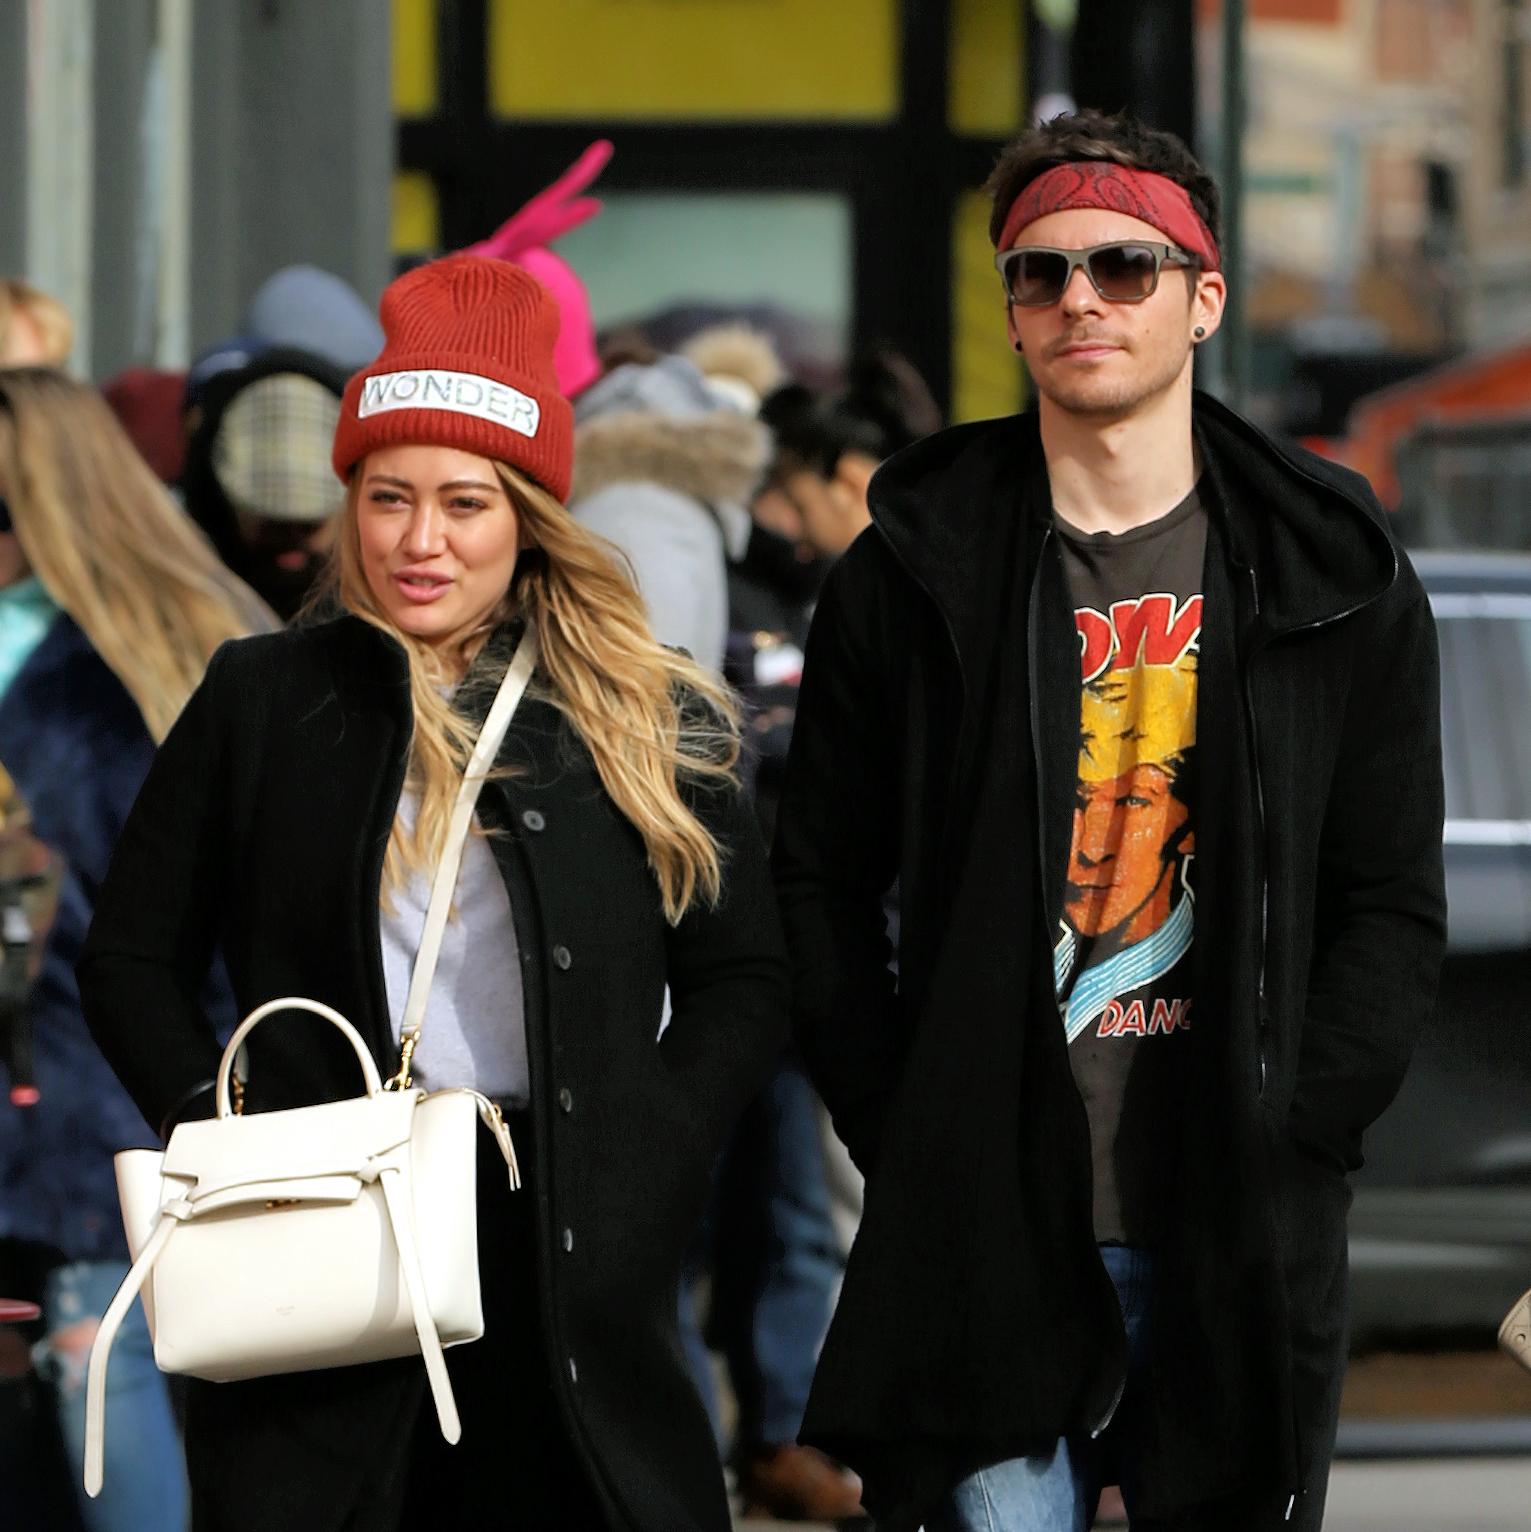 Hilary Duff and her boyfriend Matthew Koma shop in Soho in New York City on Dec. 20, 2017.